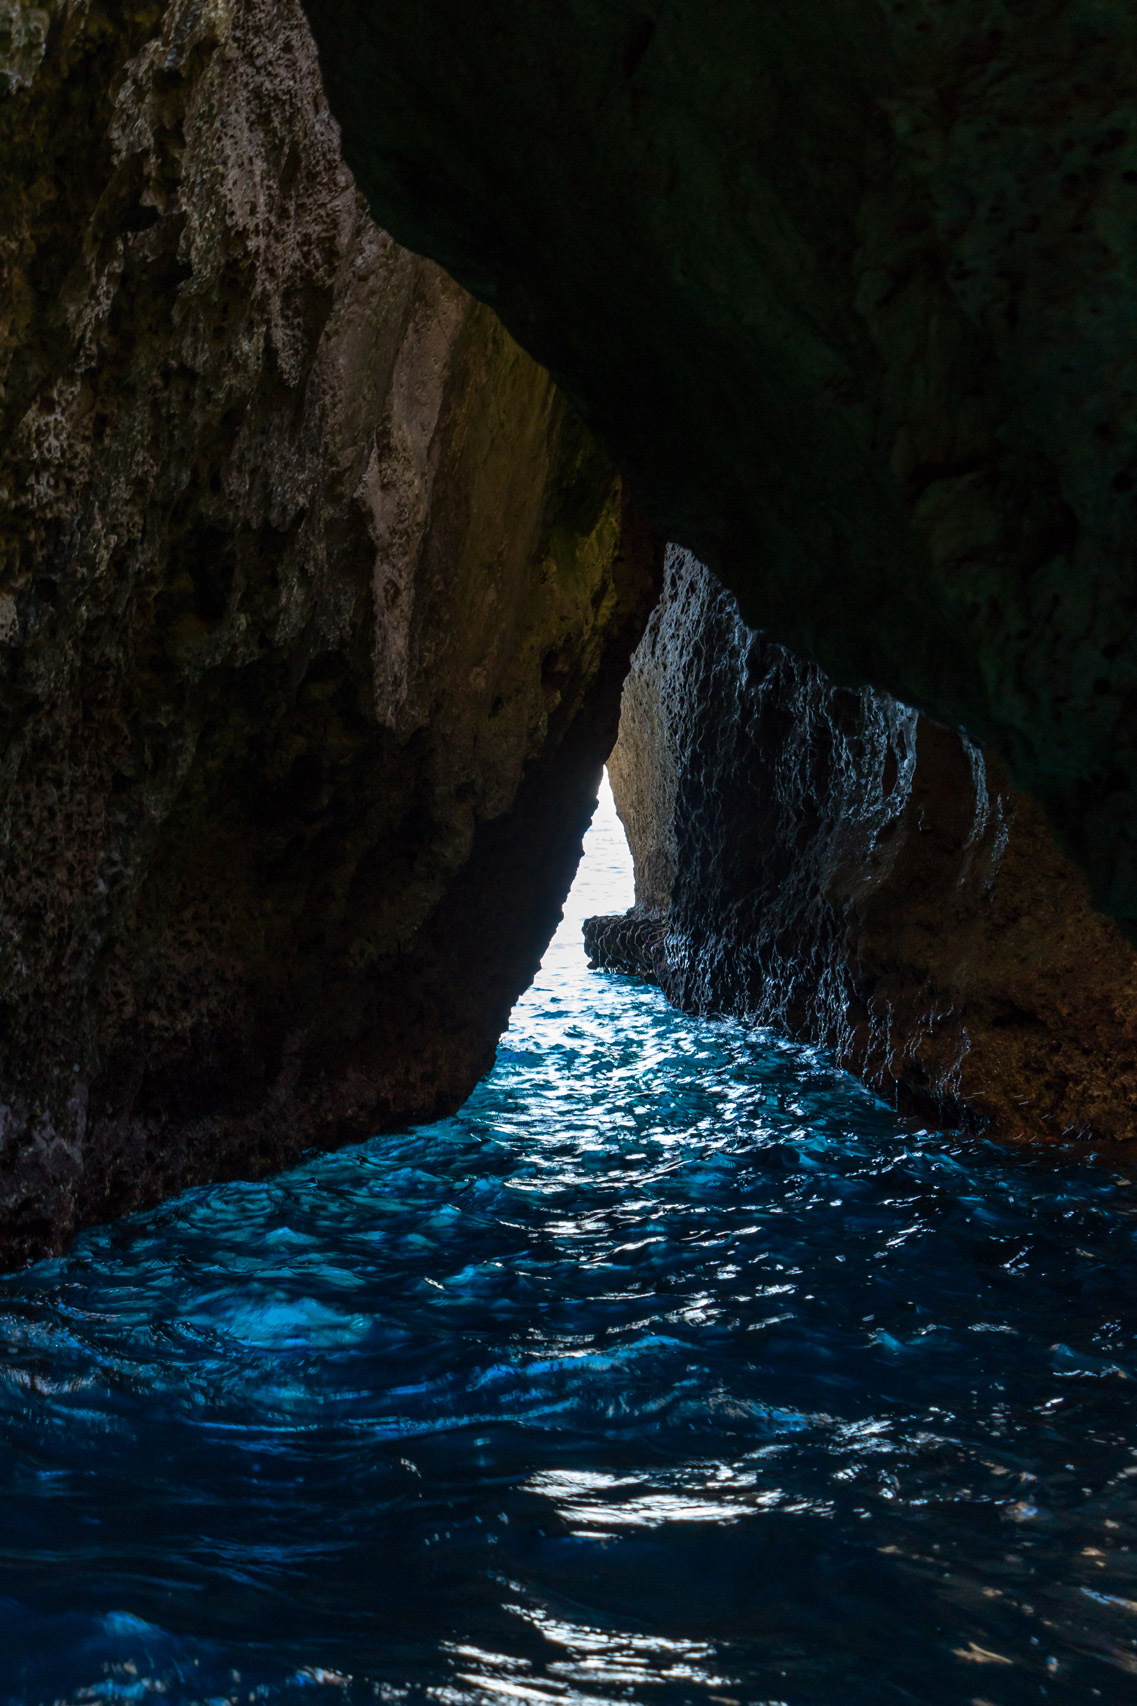 Marettimo island, Western Sicily